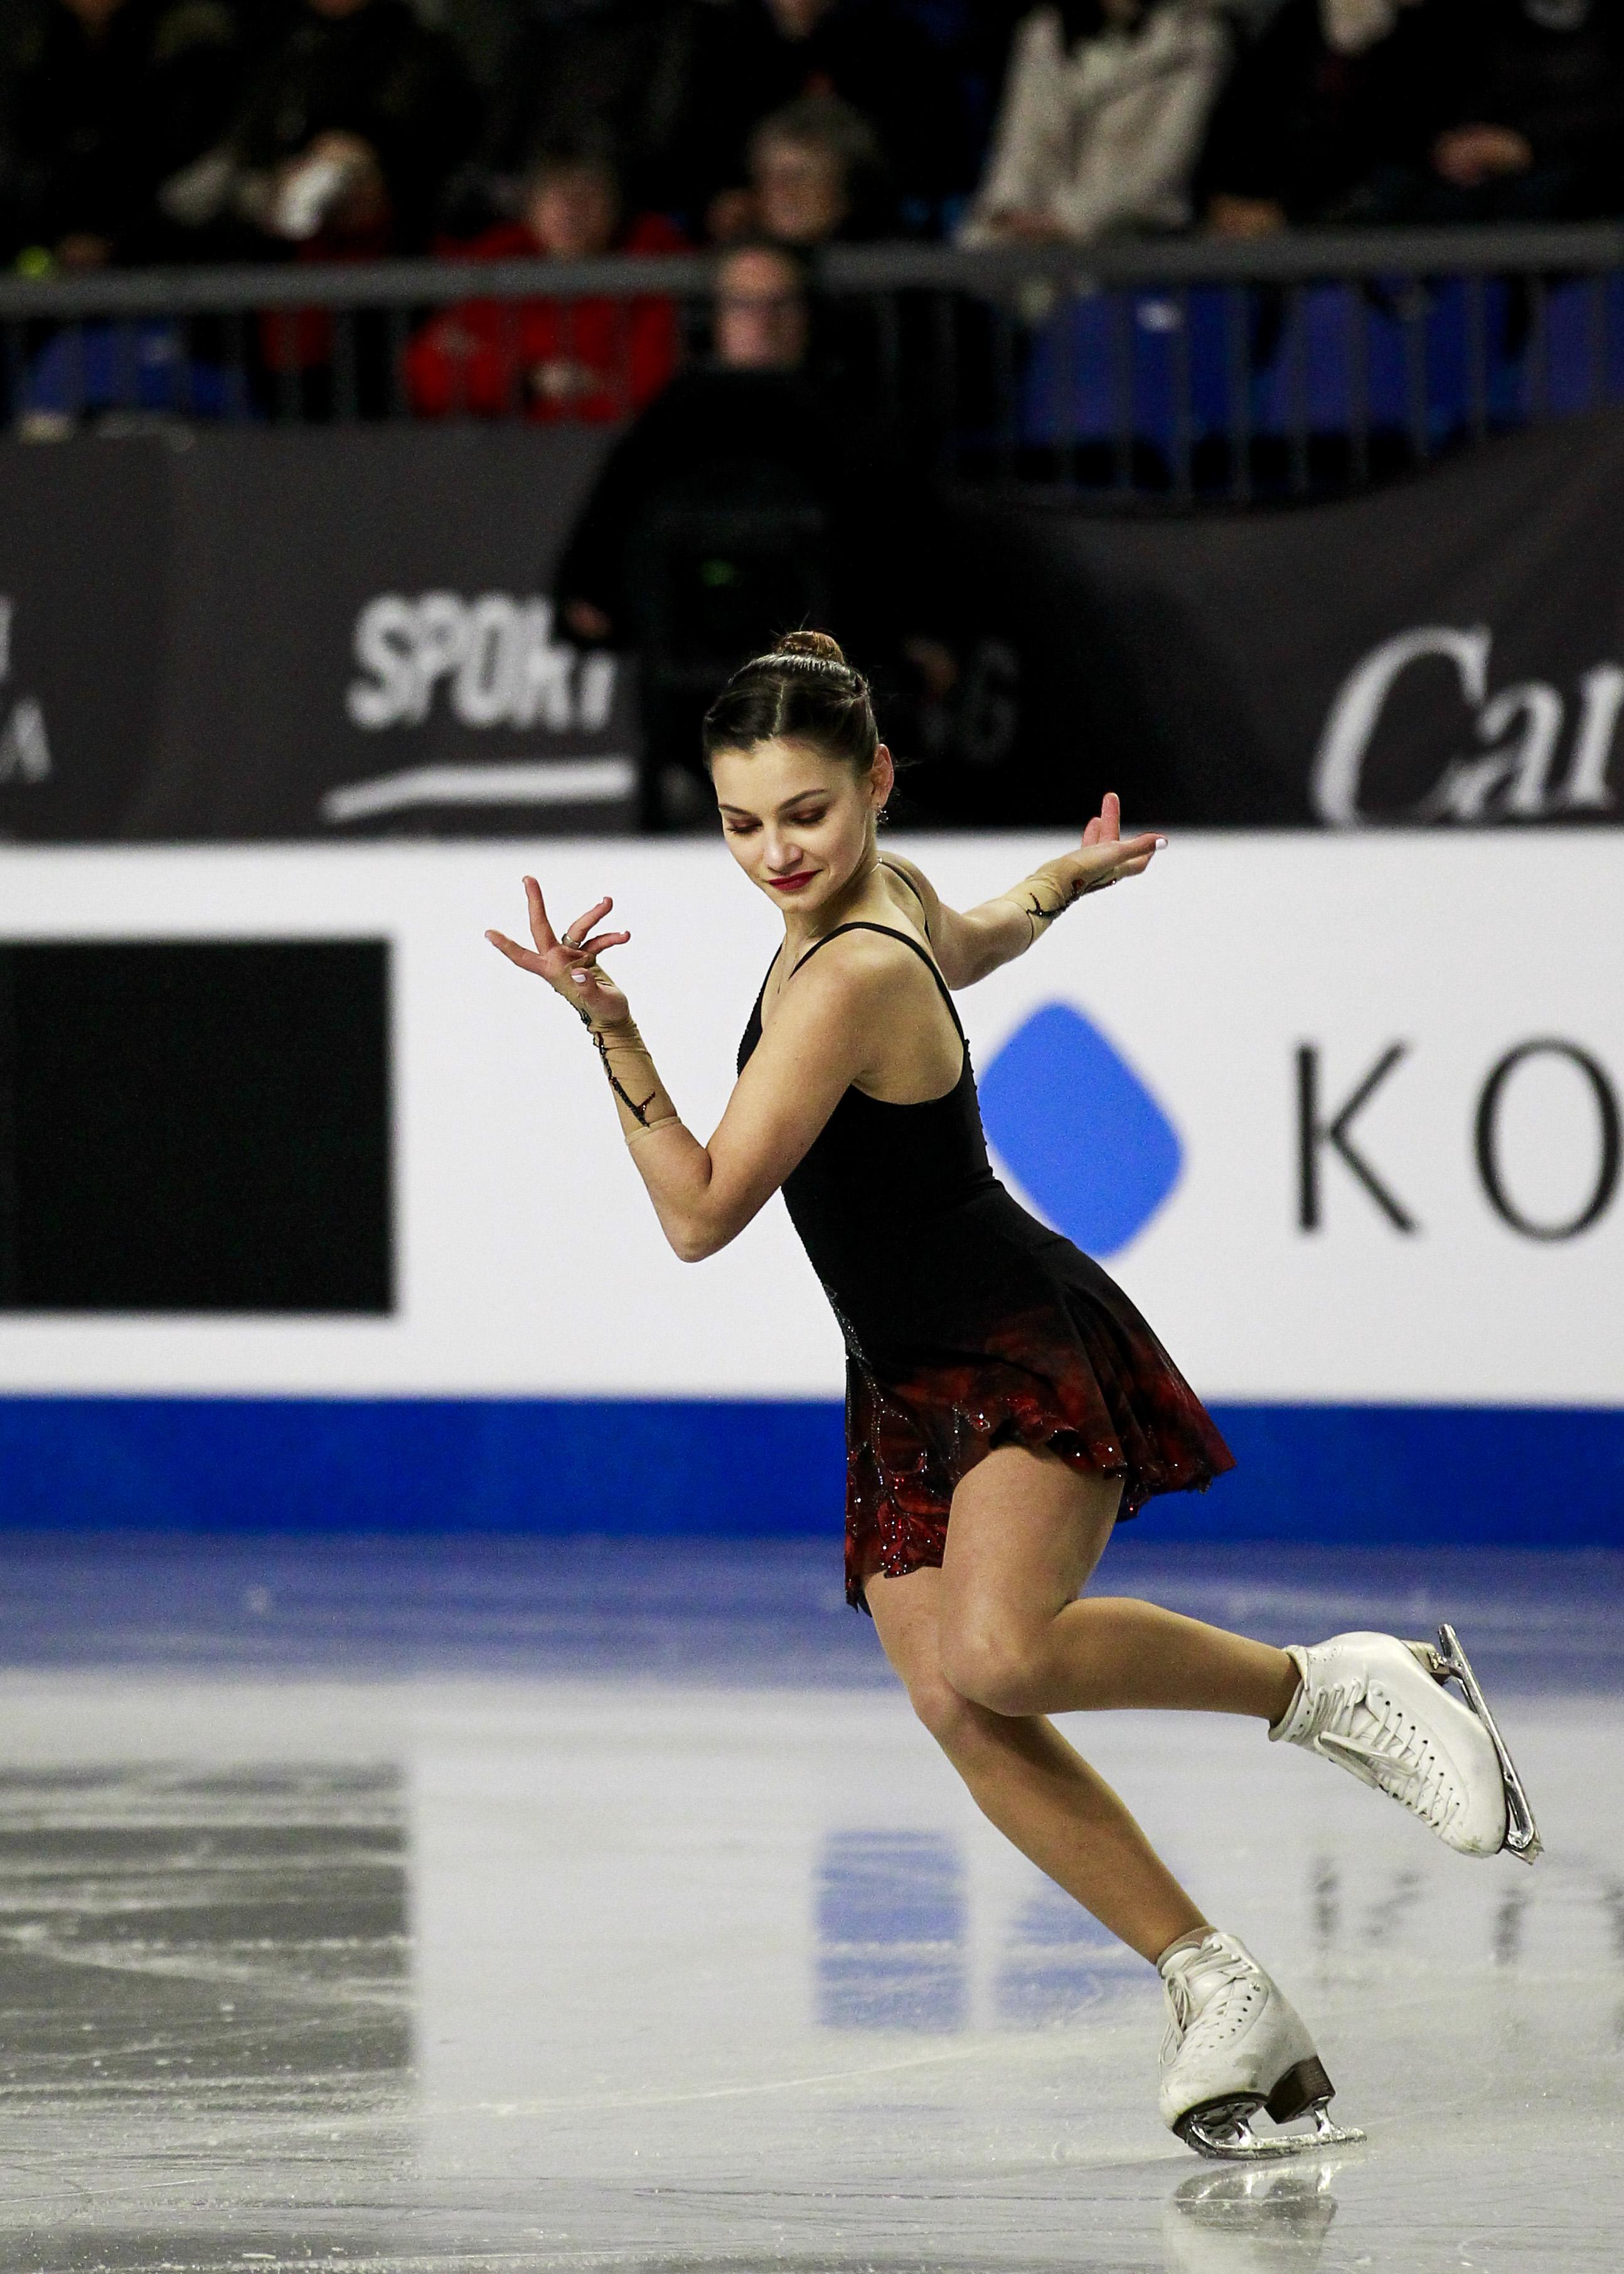 Sofia Samodurova from Russia.